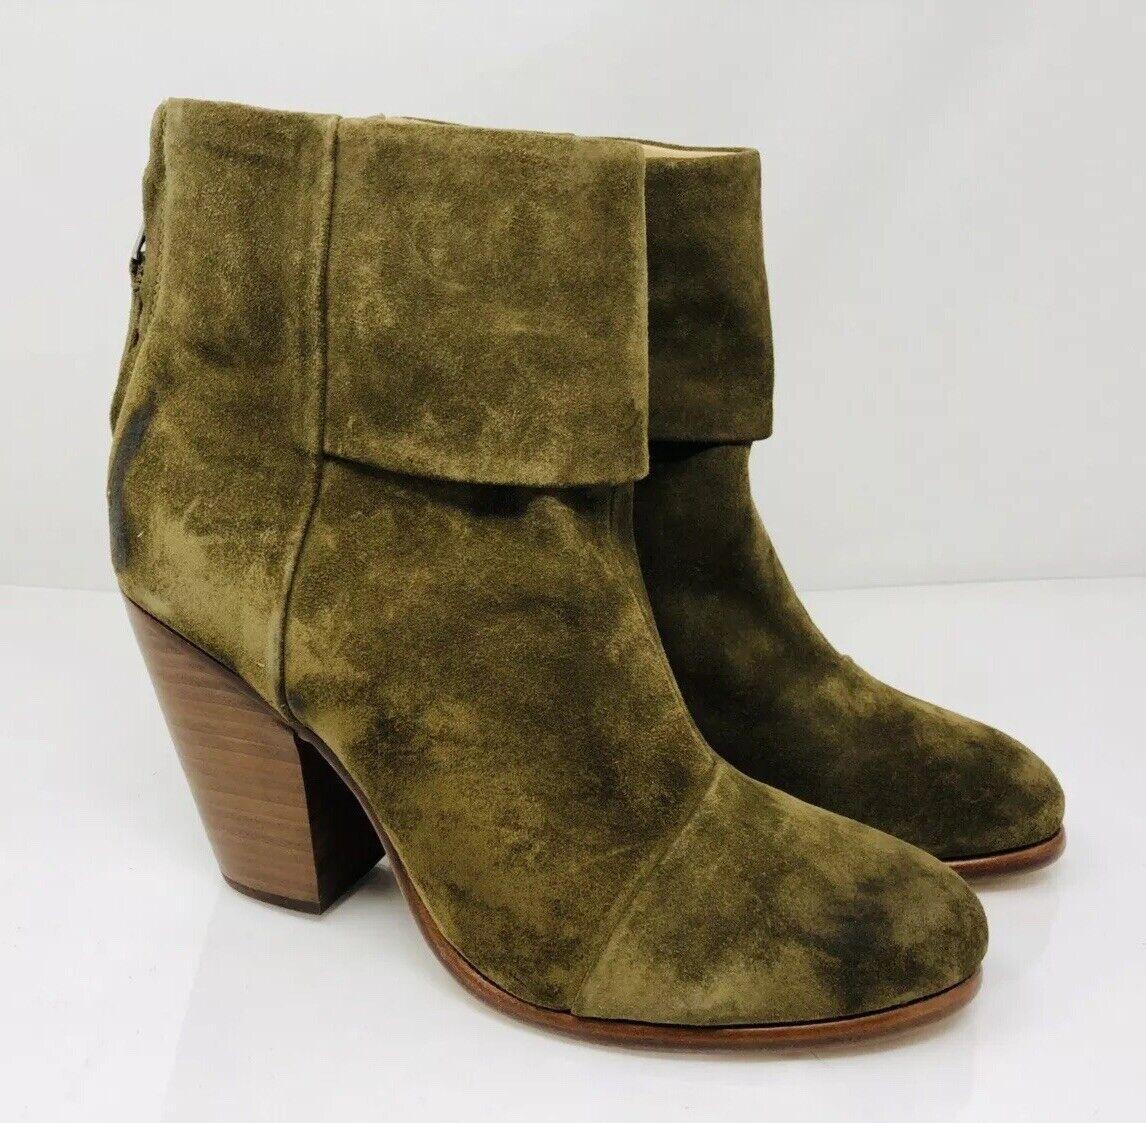 RAG & BONE Women's 'Newbury' Ankle Booties Size 38.5 Olive Suede, MSRP  475